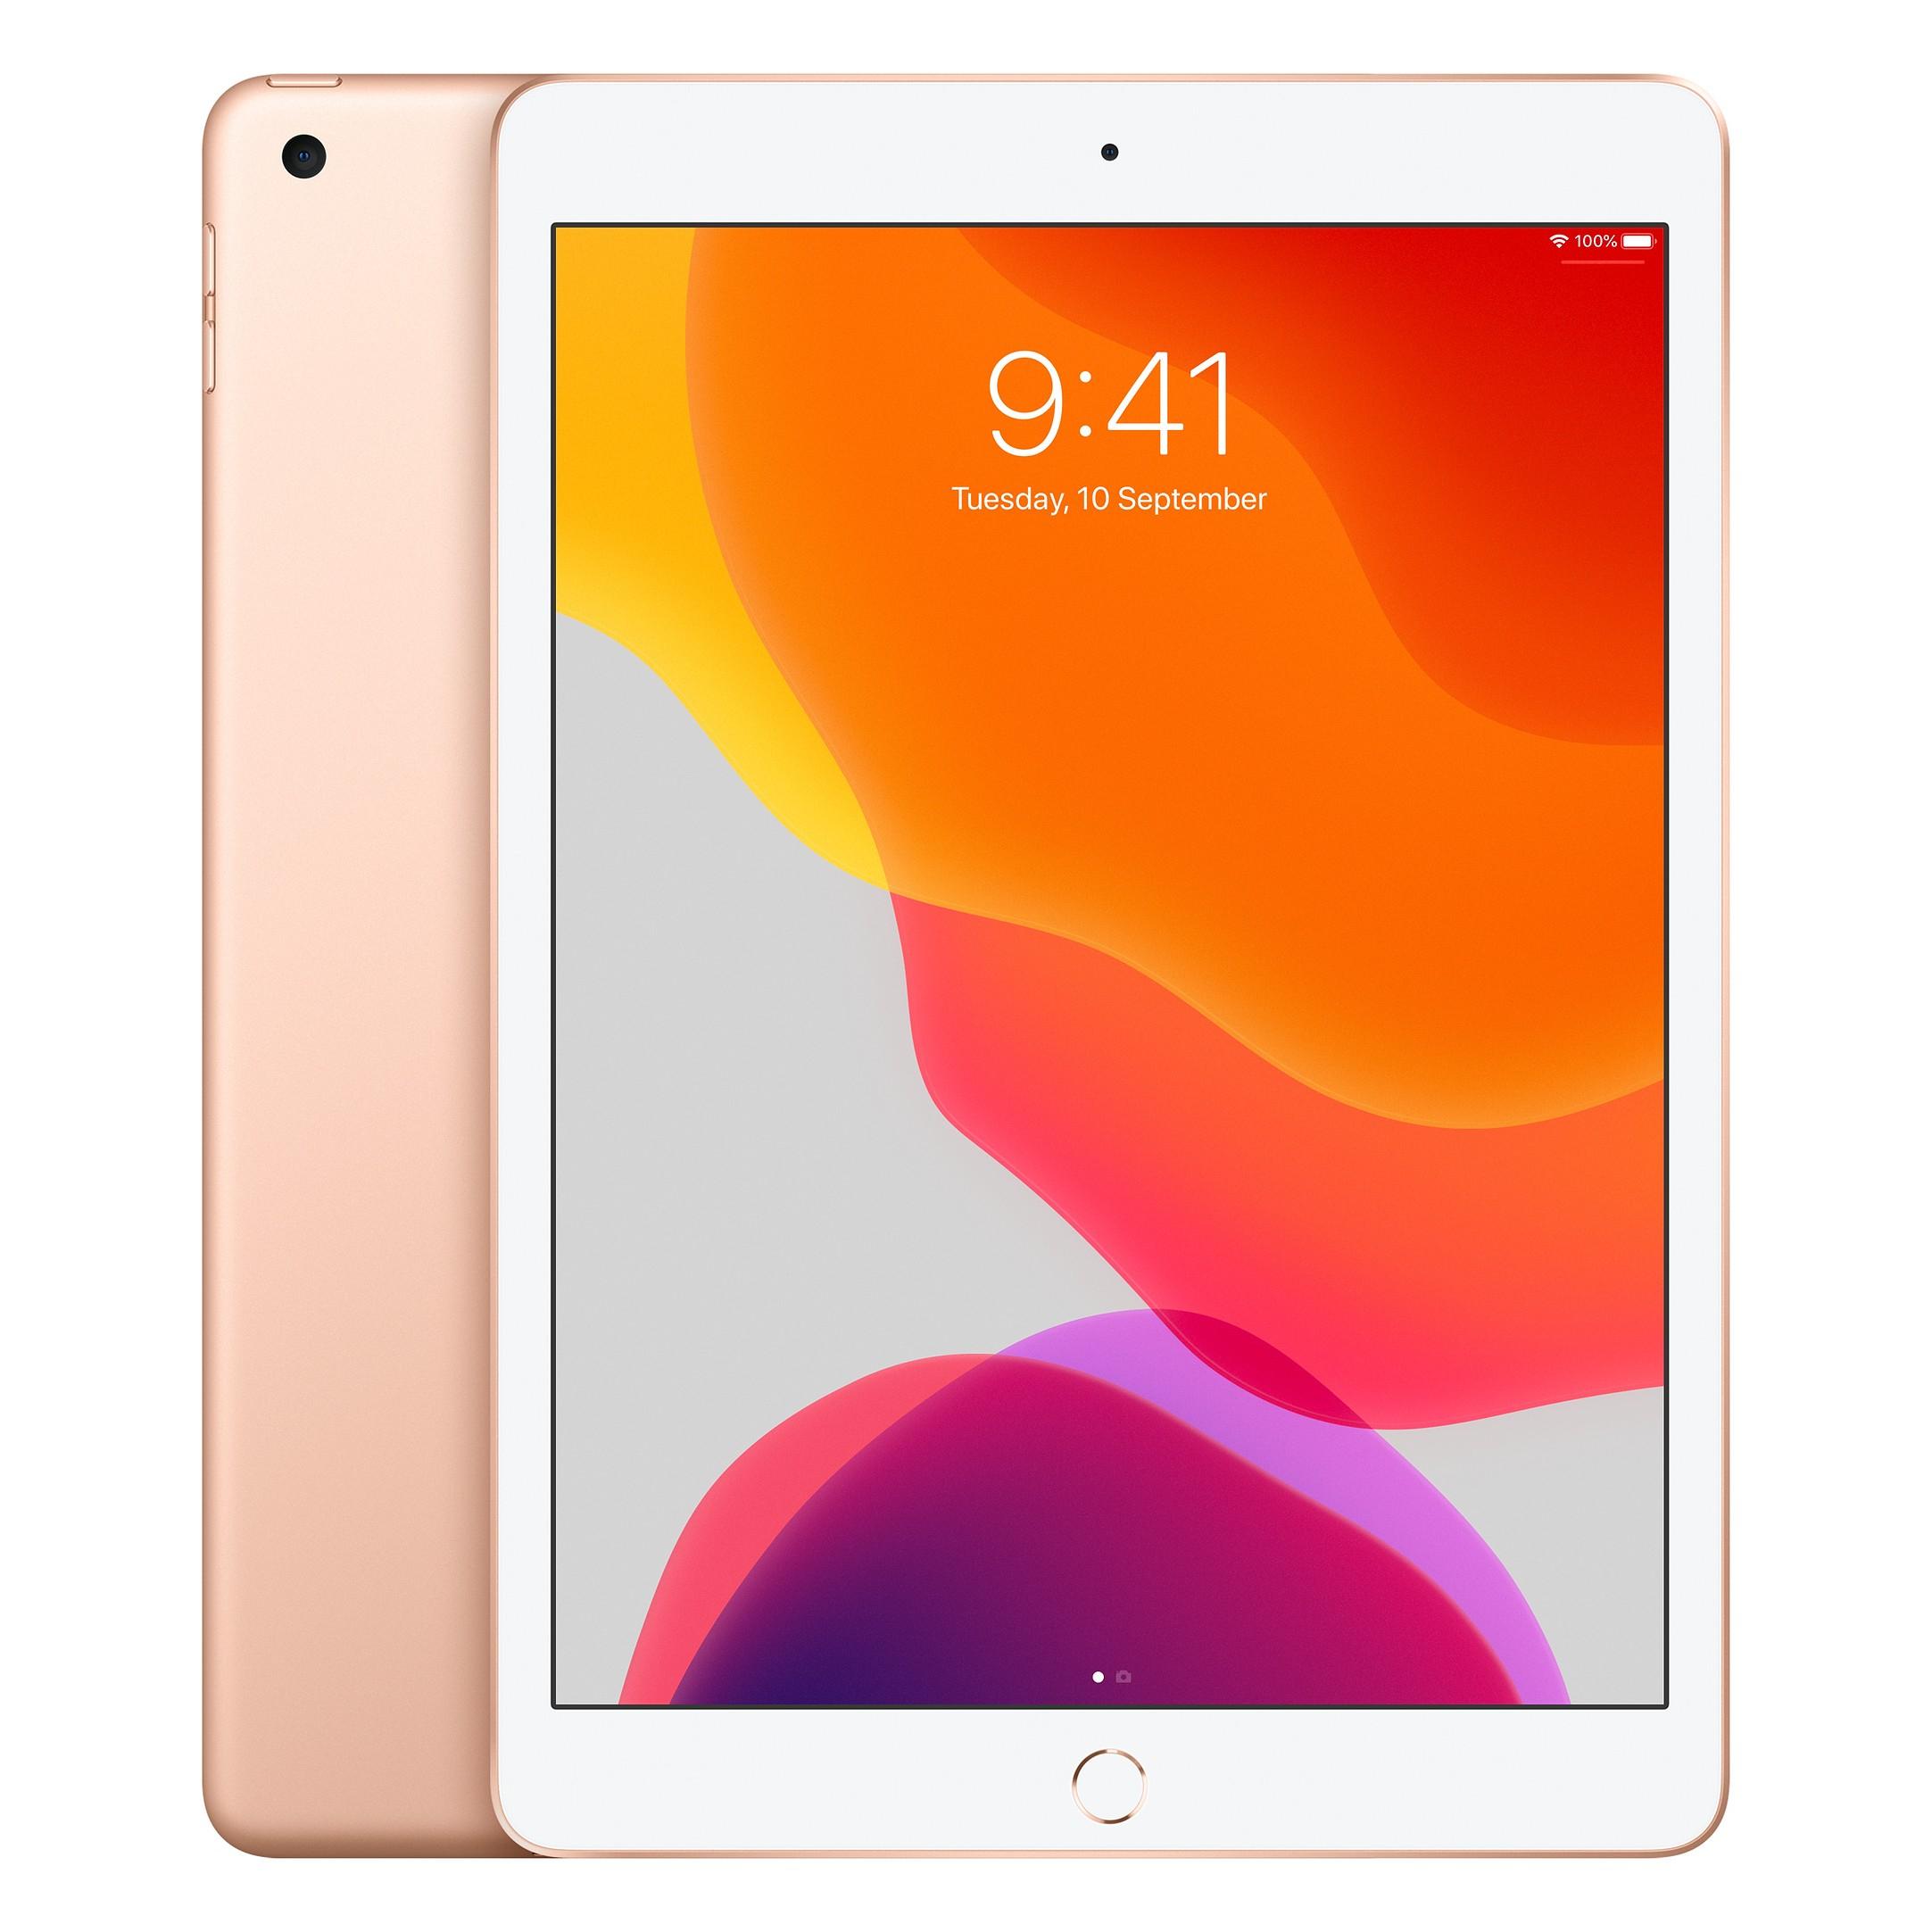 Apple iPad 10.2 (2020) 32GB Wifi - Oro ¡MÍNIMO HISTÓRICO! (idealo)